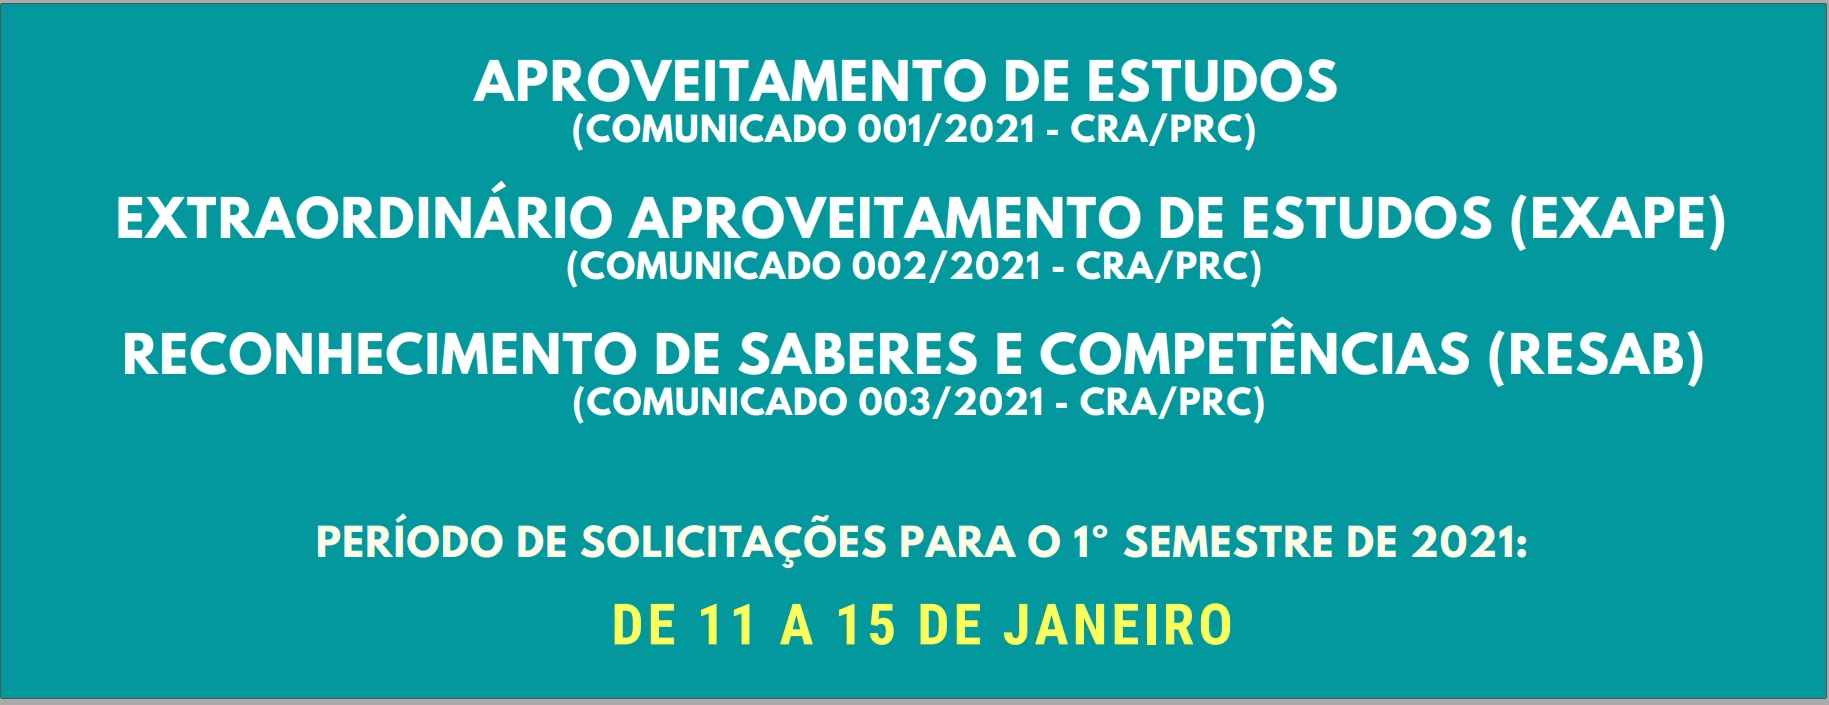 1º semestre 2021